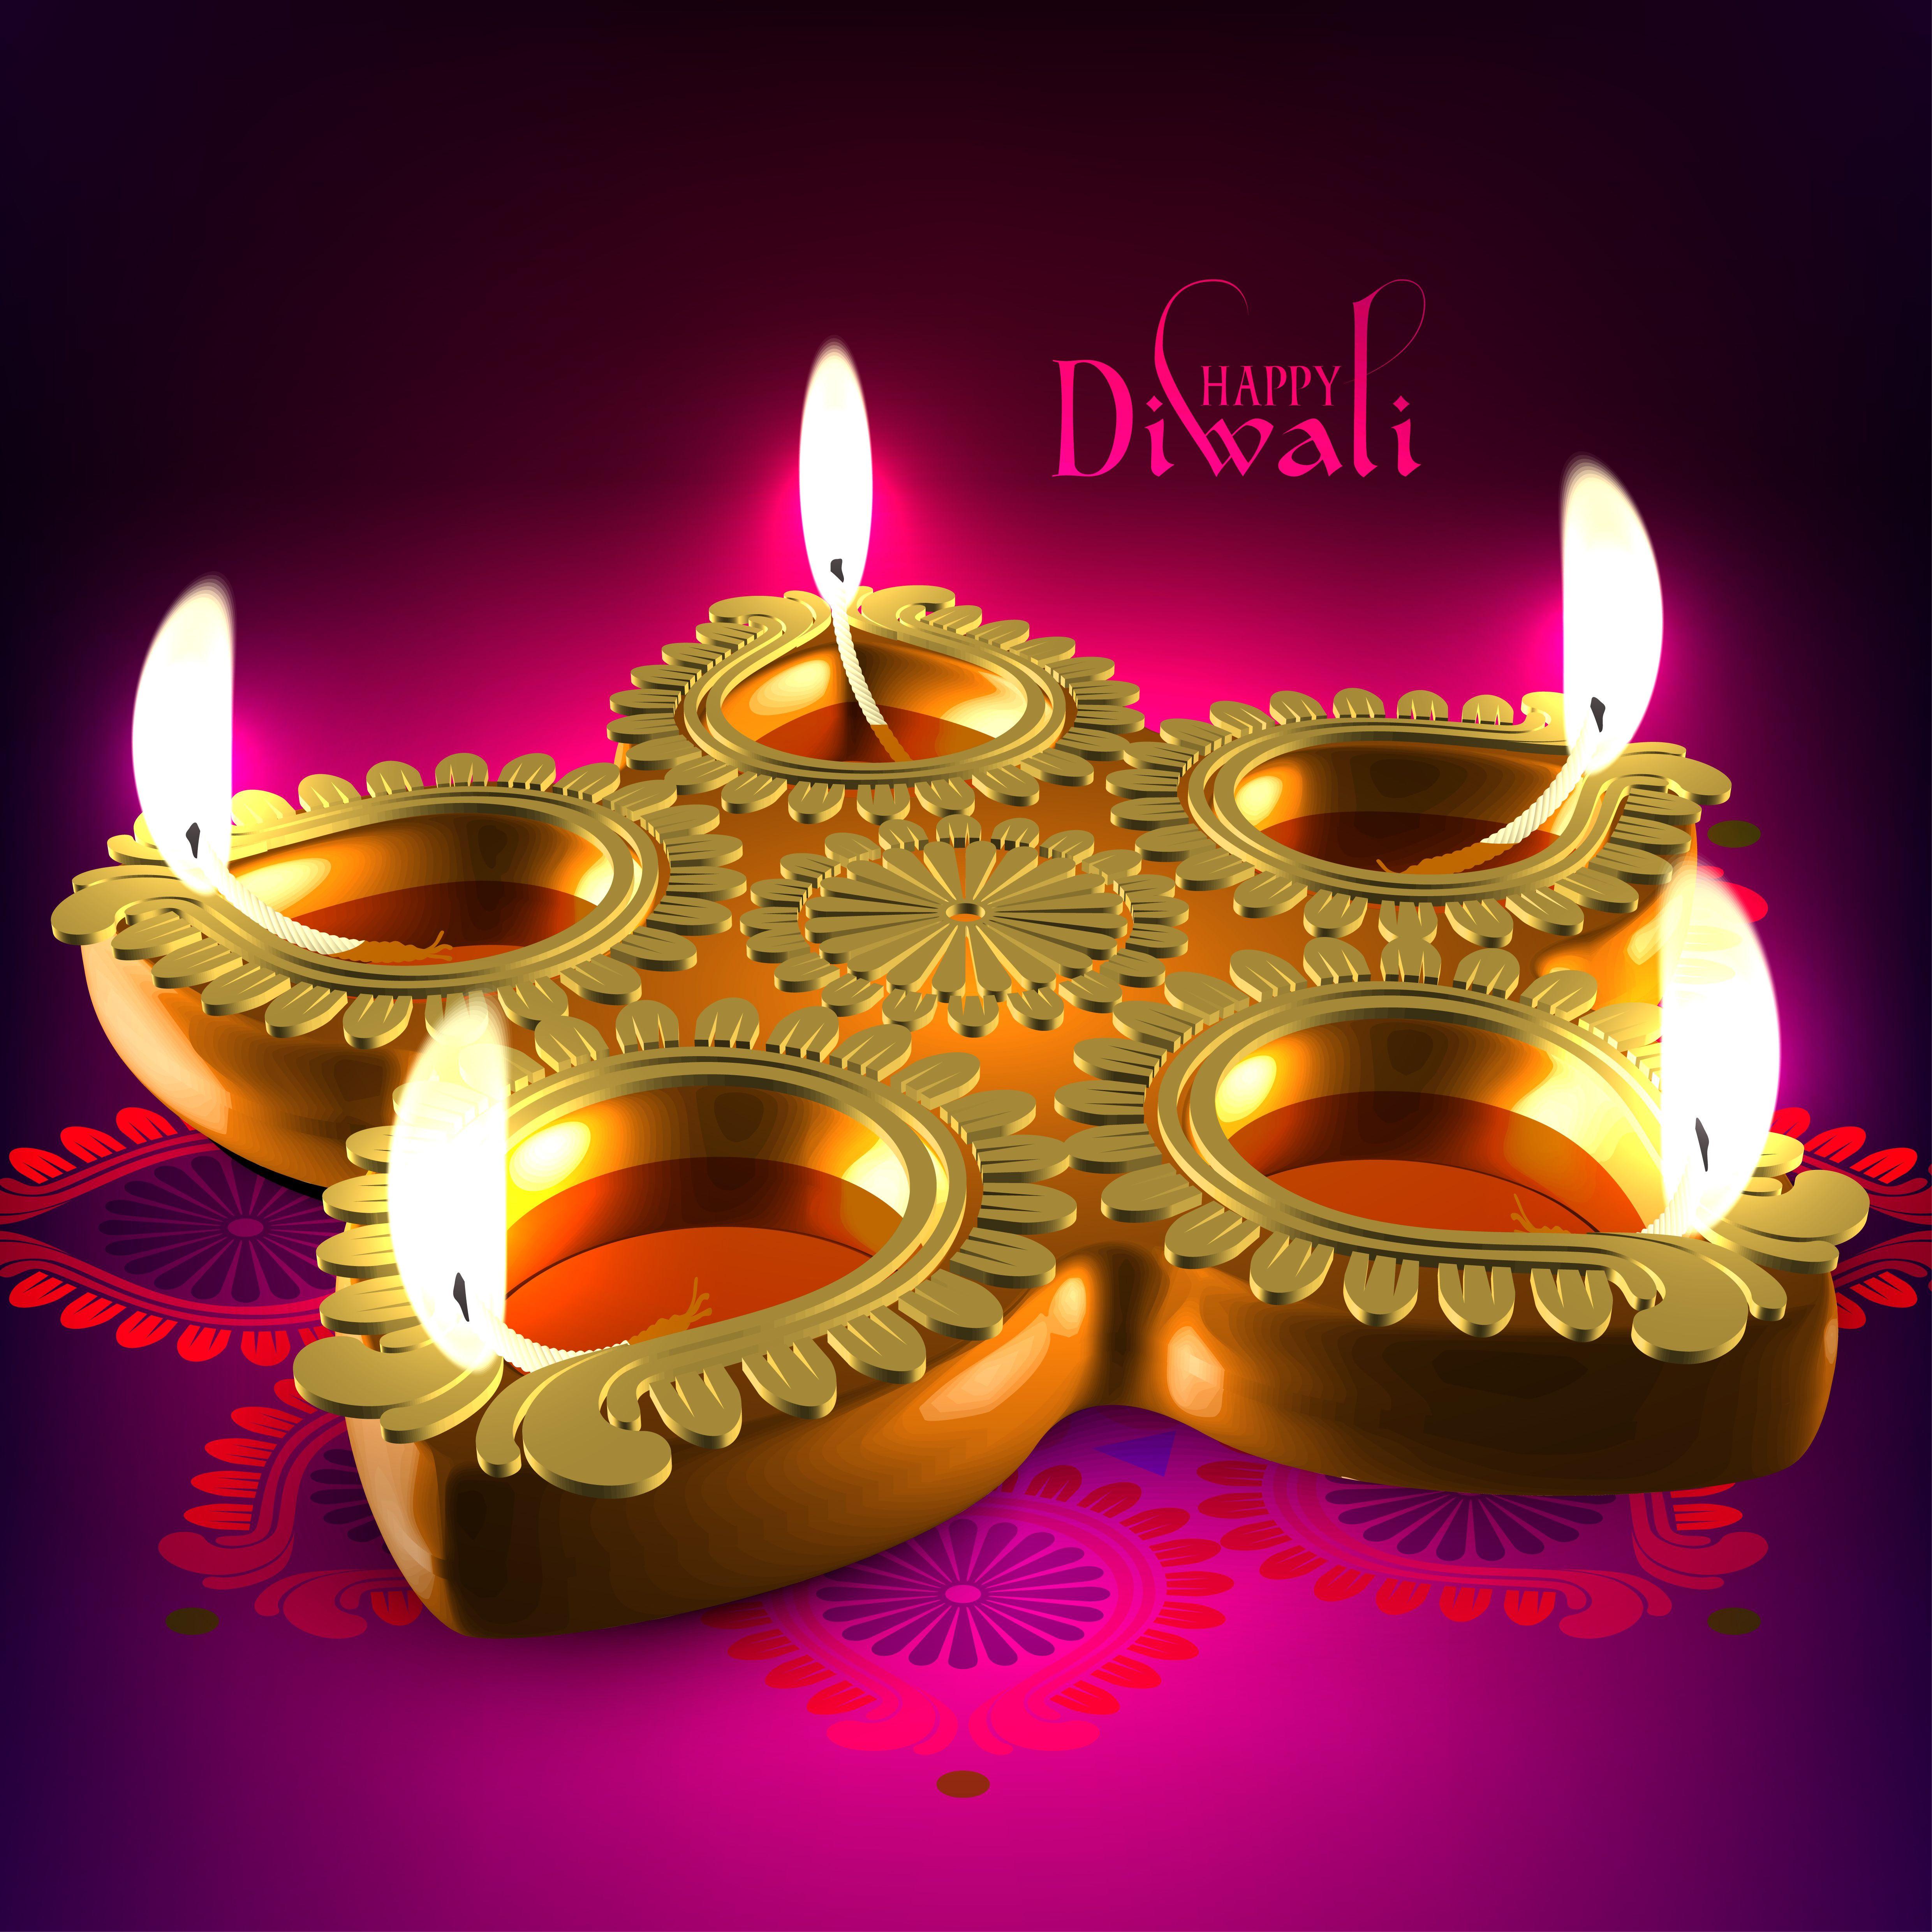 Diwali 2018 Diwali Festival Of Lights Deepavali Festival 2018